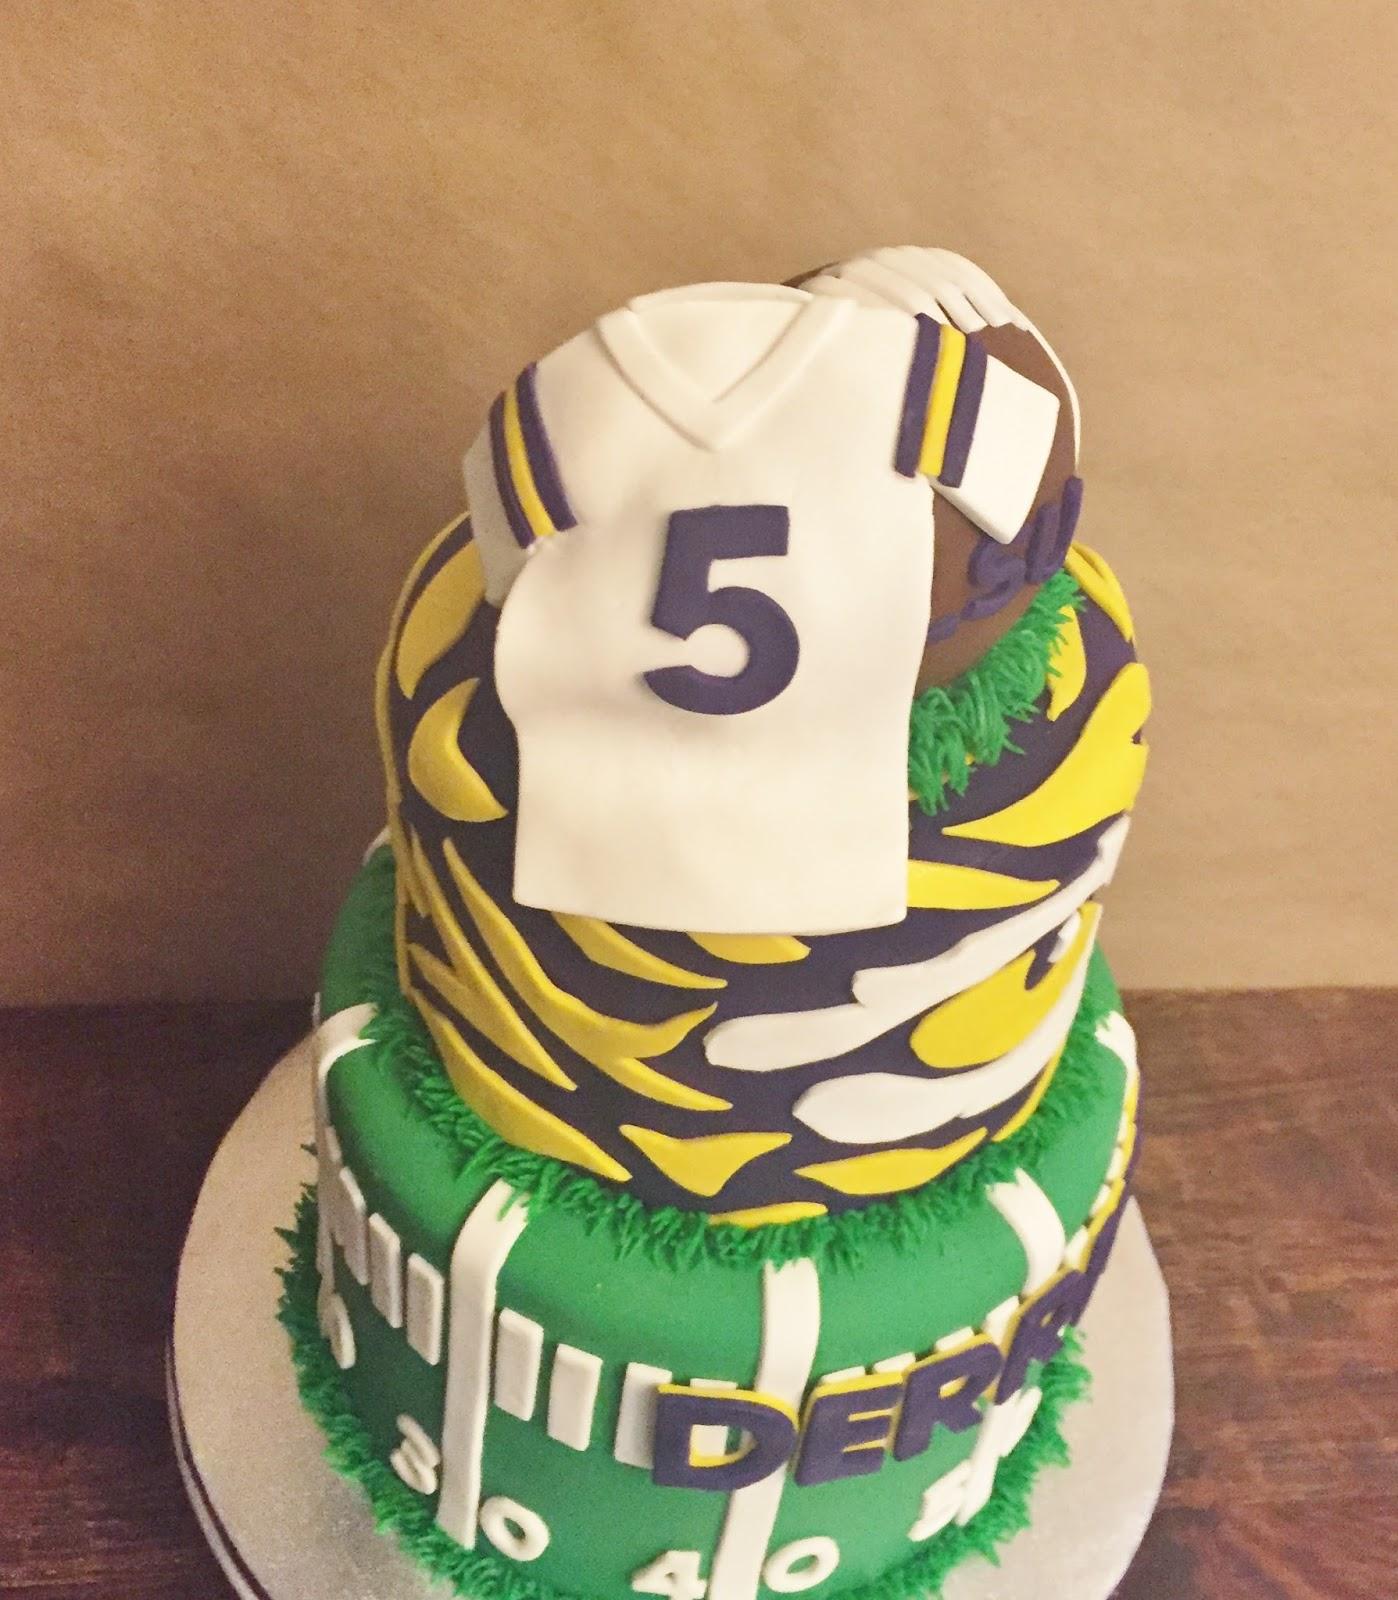 Enjoyable Cakes By Mindy Lsu Tigers Football Cake 6 8 Funny Birthday Cards Online Necthendildamsfinfo